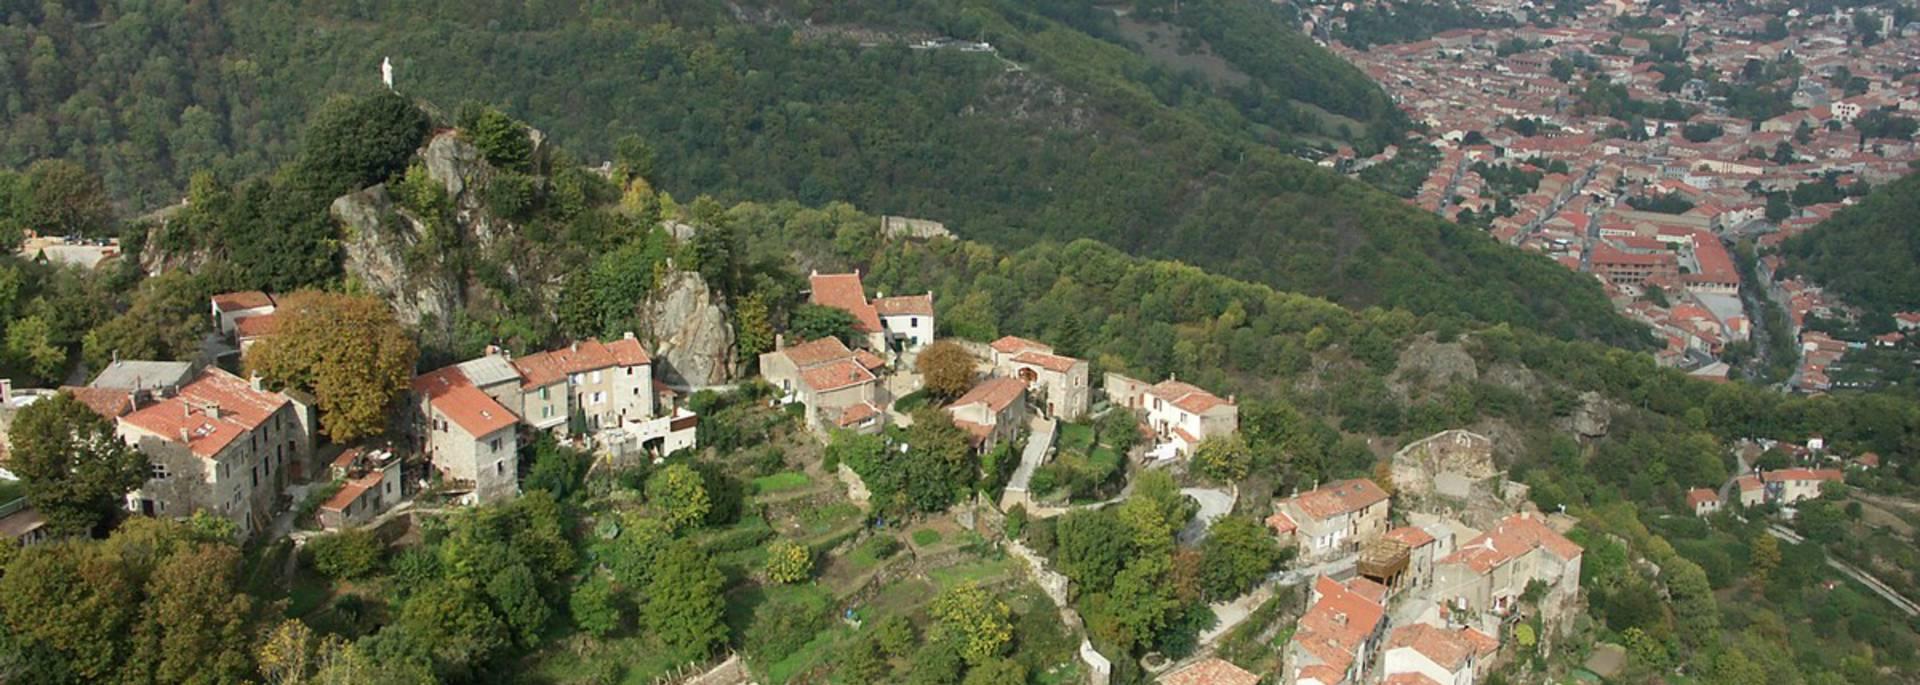 Le hameau de Hautpoul, au loin, Mazamet